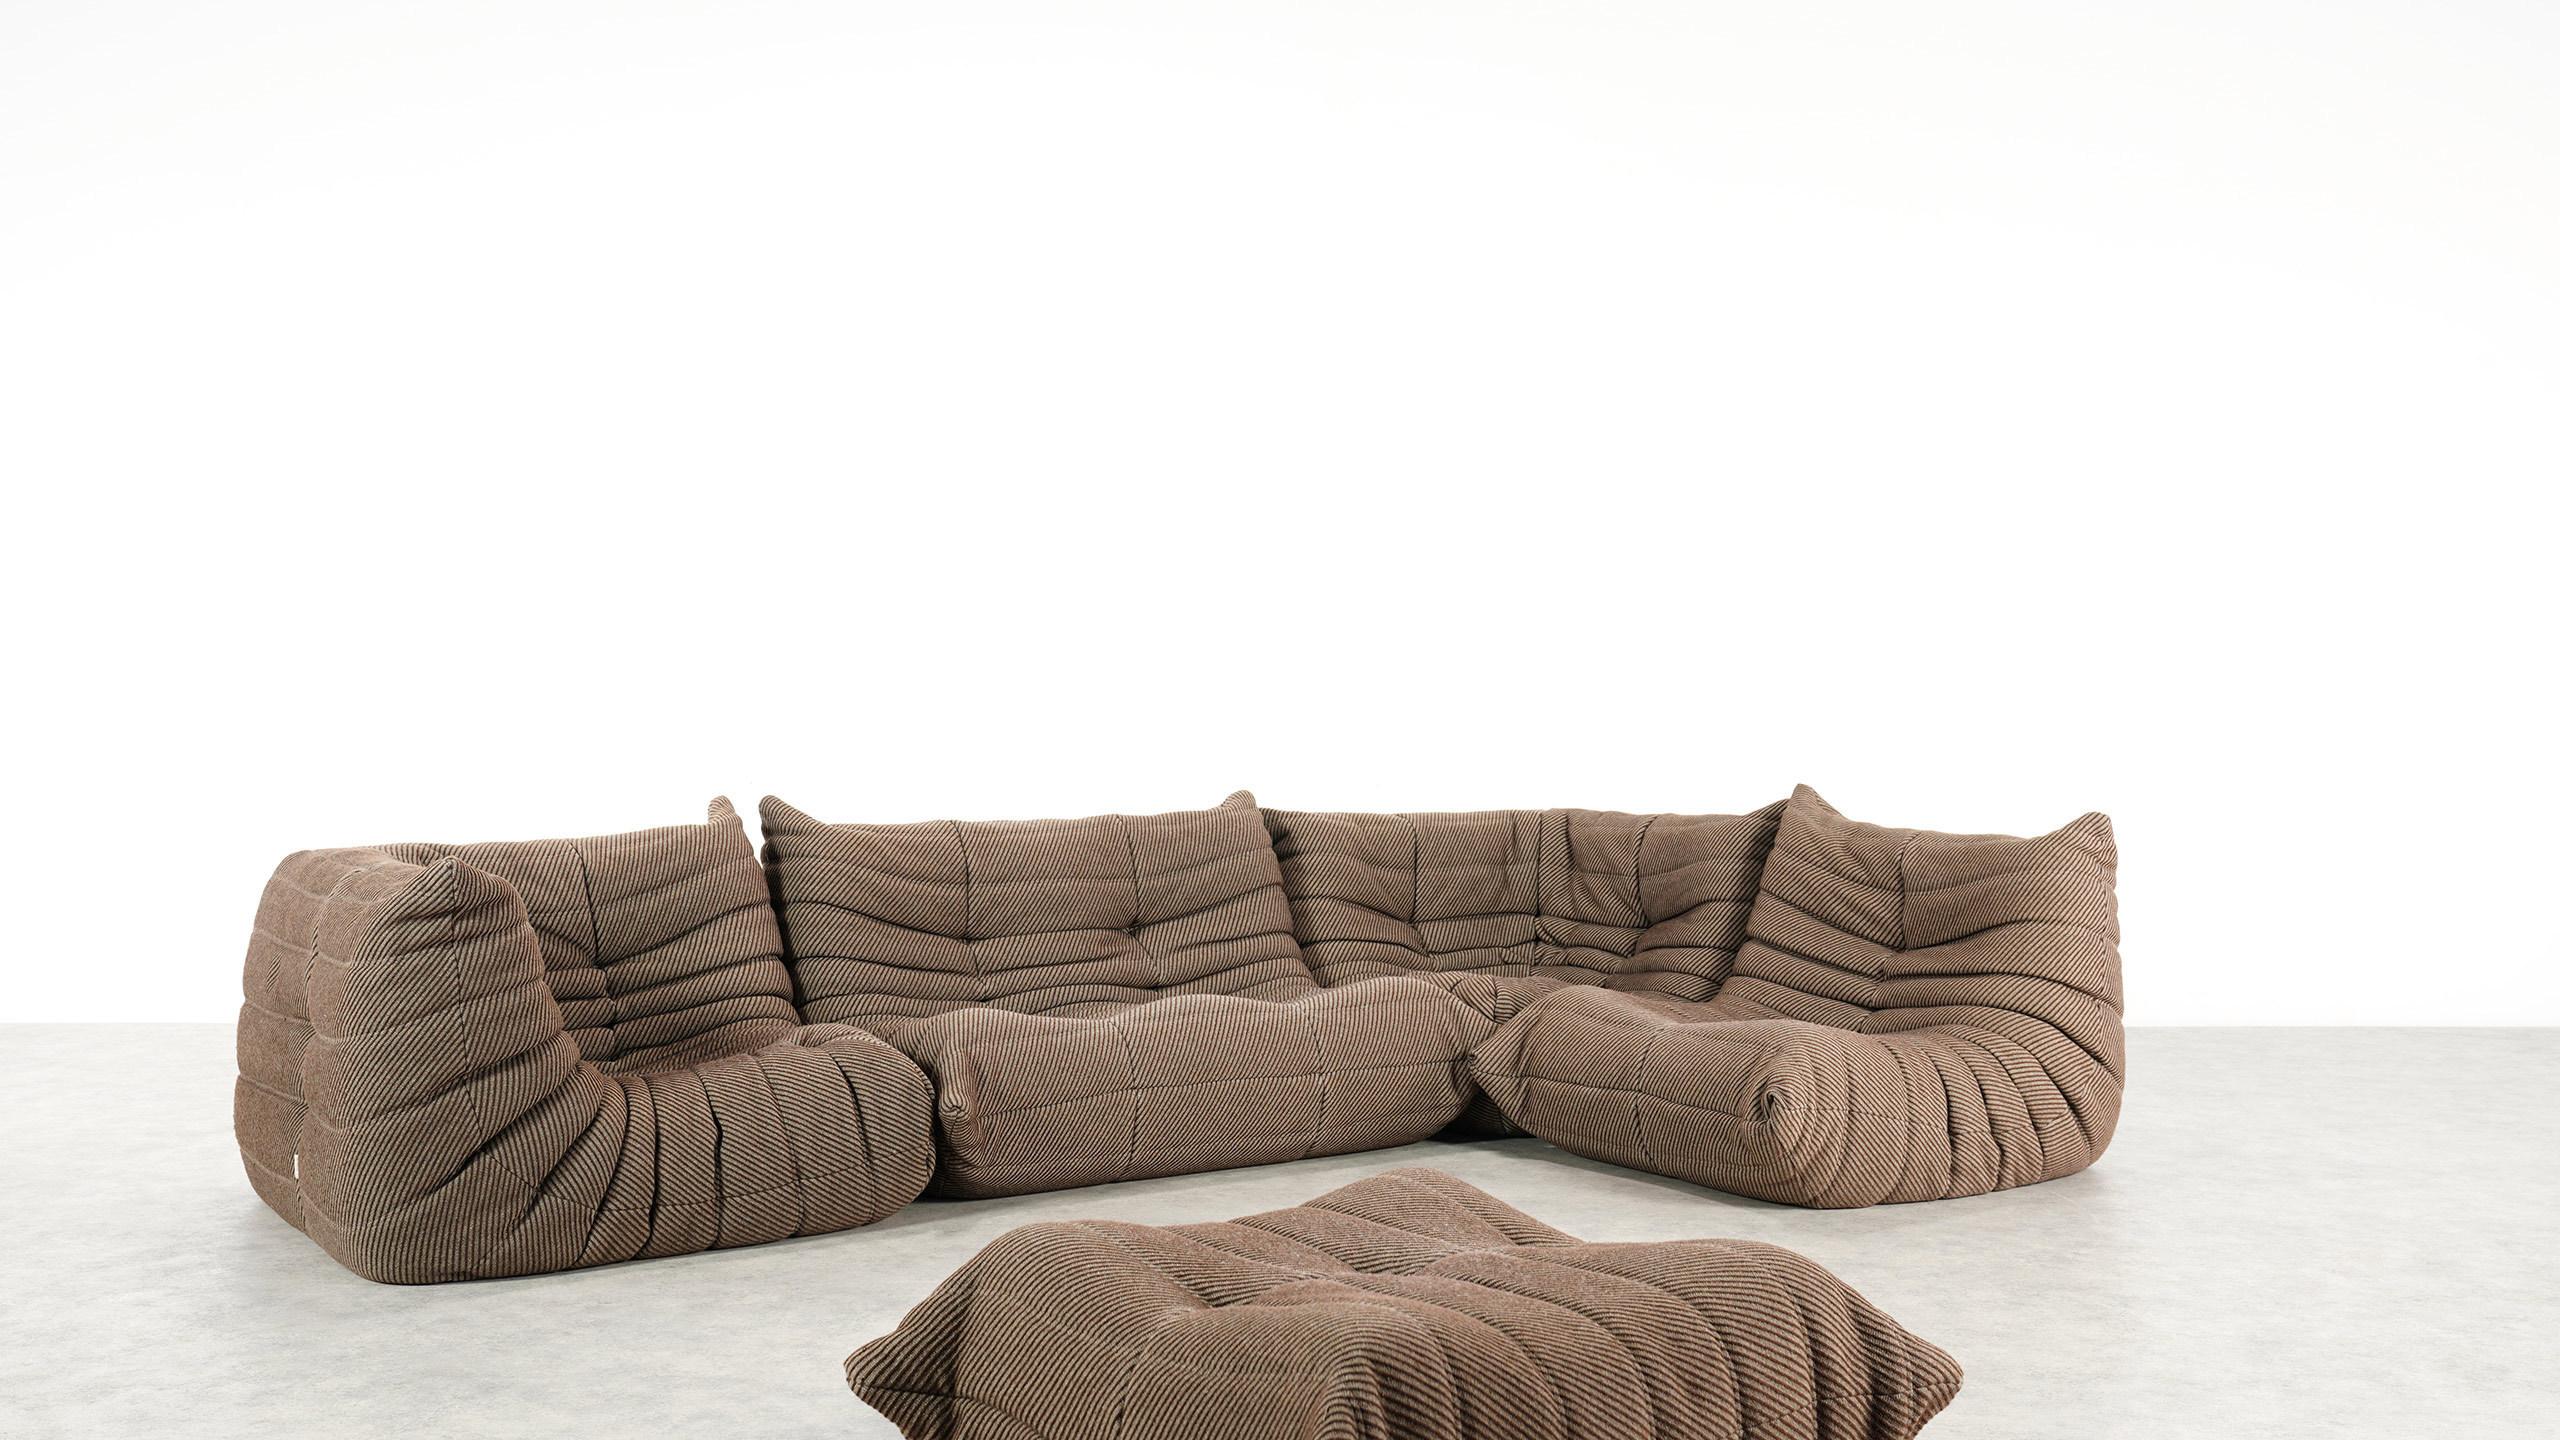 Full Size of Ligne Roset Sofa Togo Dimensions Bed Replica Feng Couch For Sale Ebay Kleinanzeigen Furniture Uk Gebraucht Smala Exclusif Michel Ducaroy Eck 3 Sitzer Grau Sofa Ligne Roset Sofa